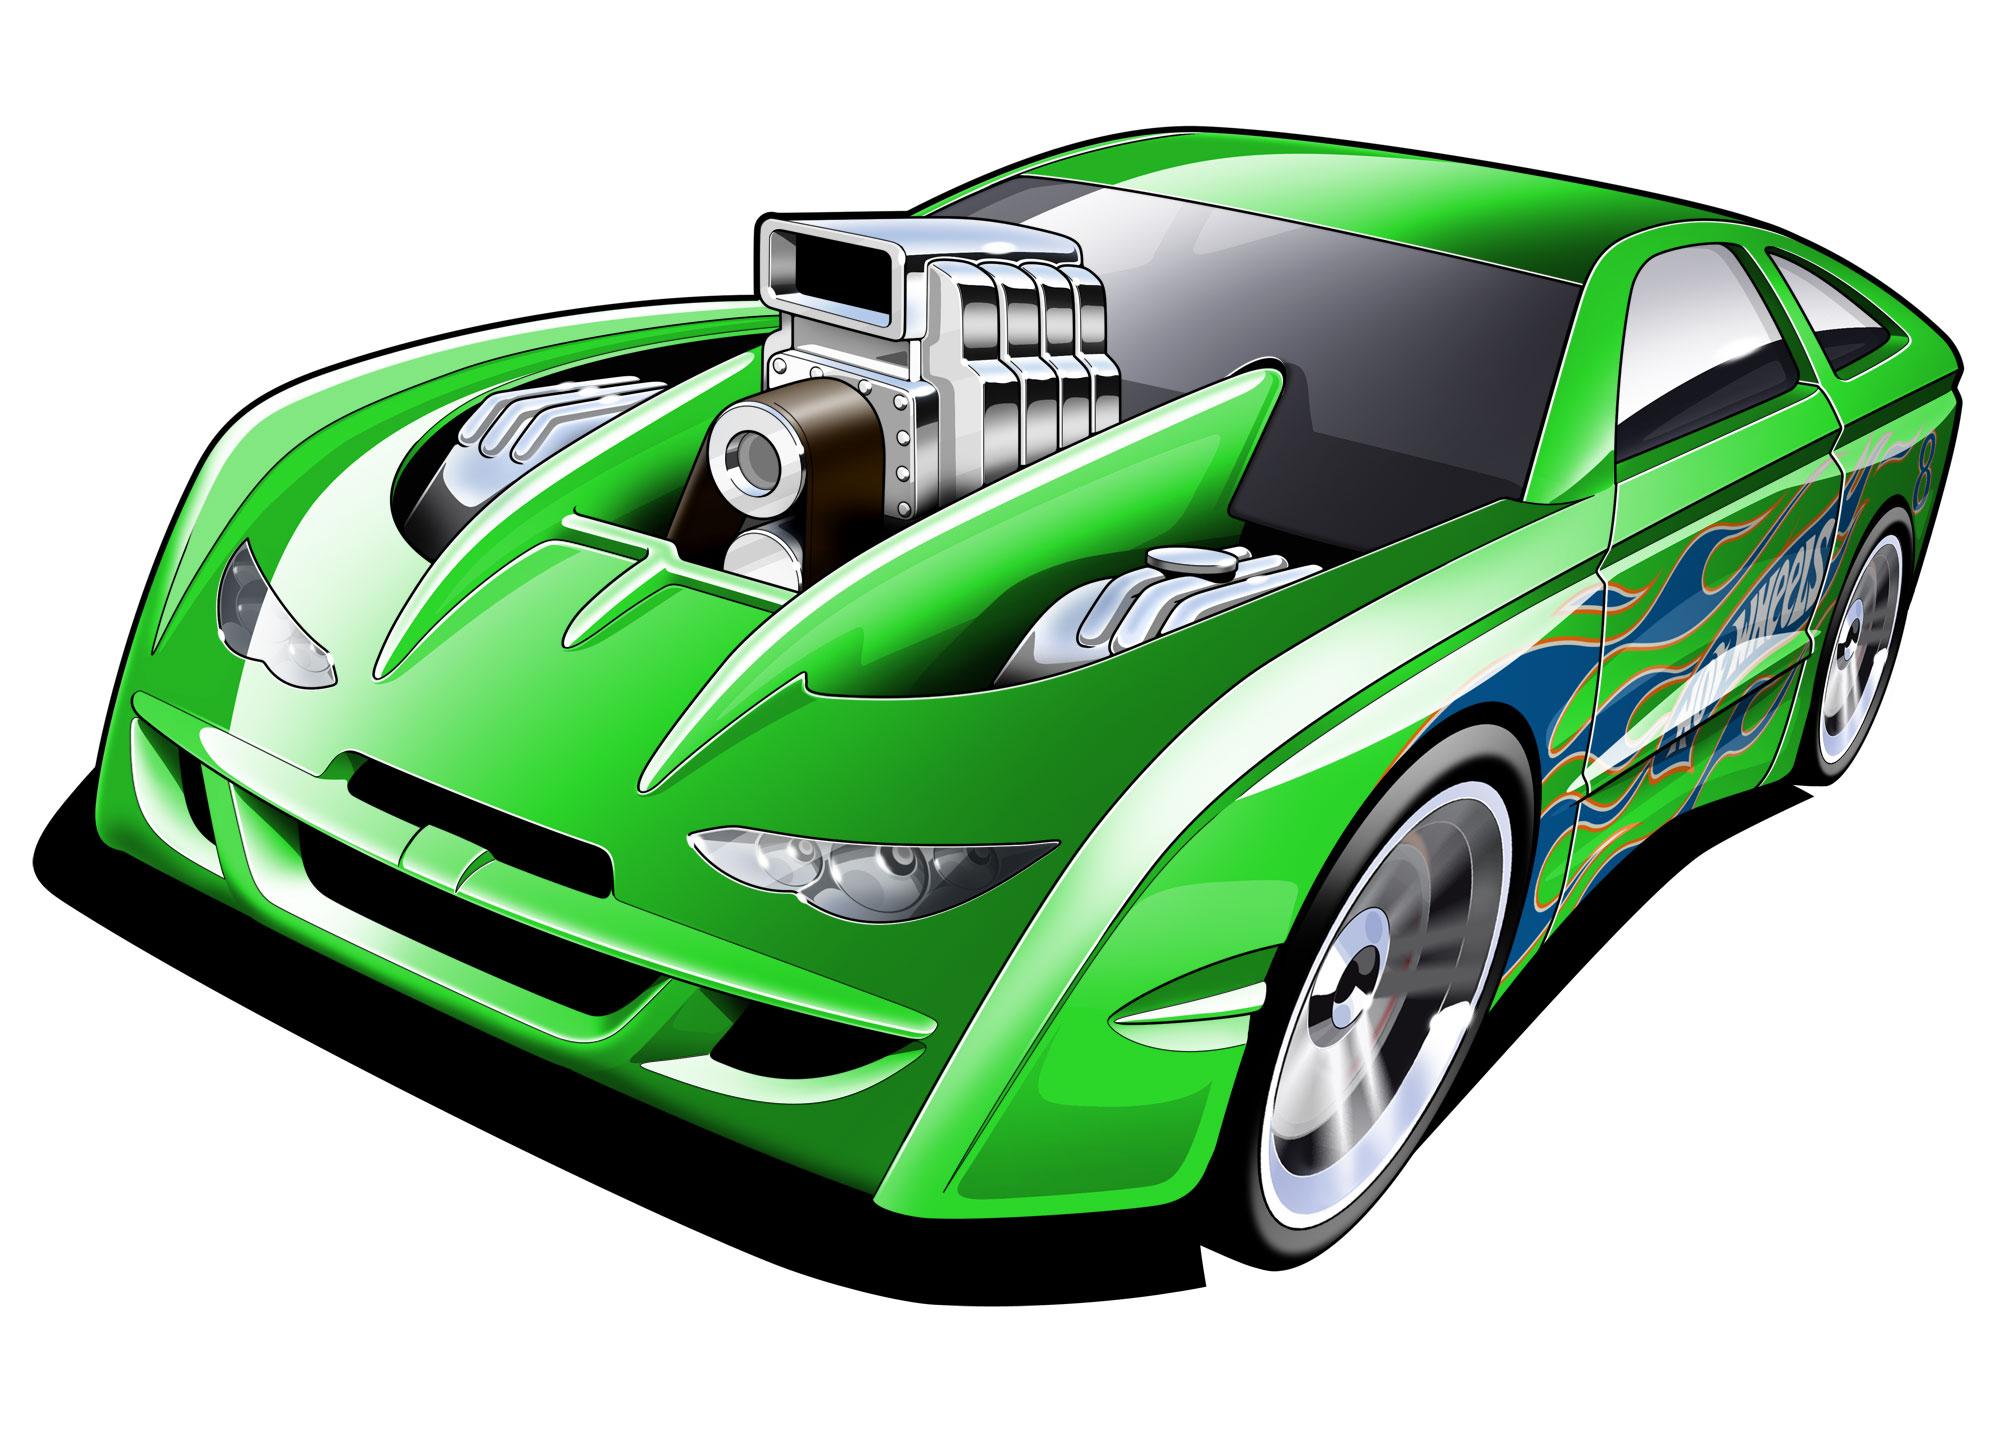 Hot Wheels clipart motor racing Coroflot at Wheels Illustration Favorite